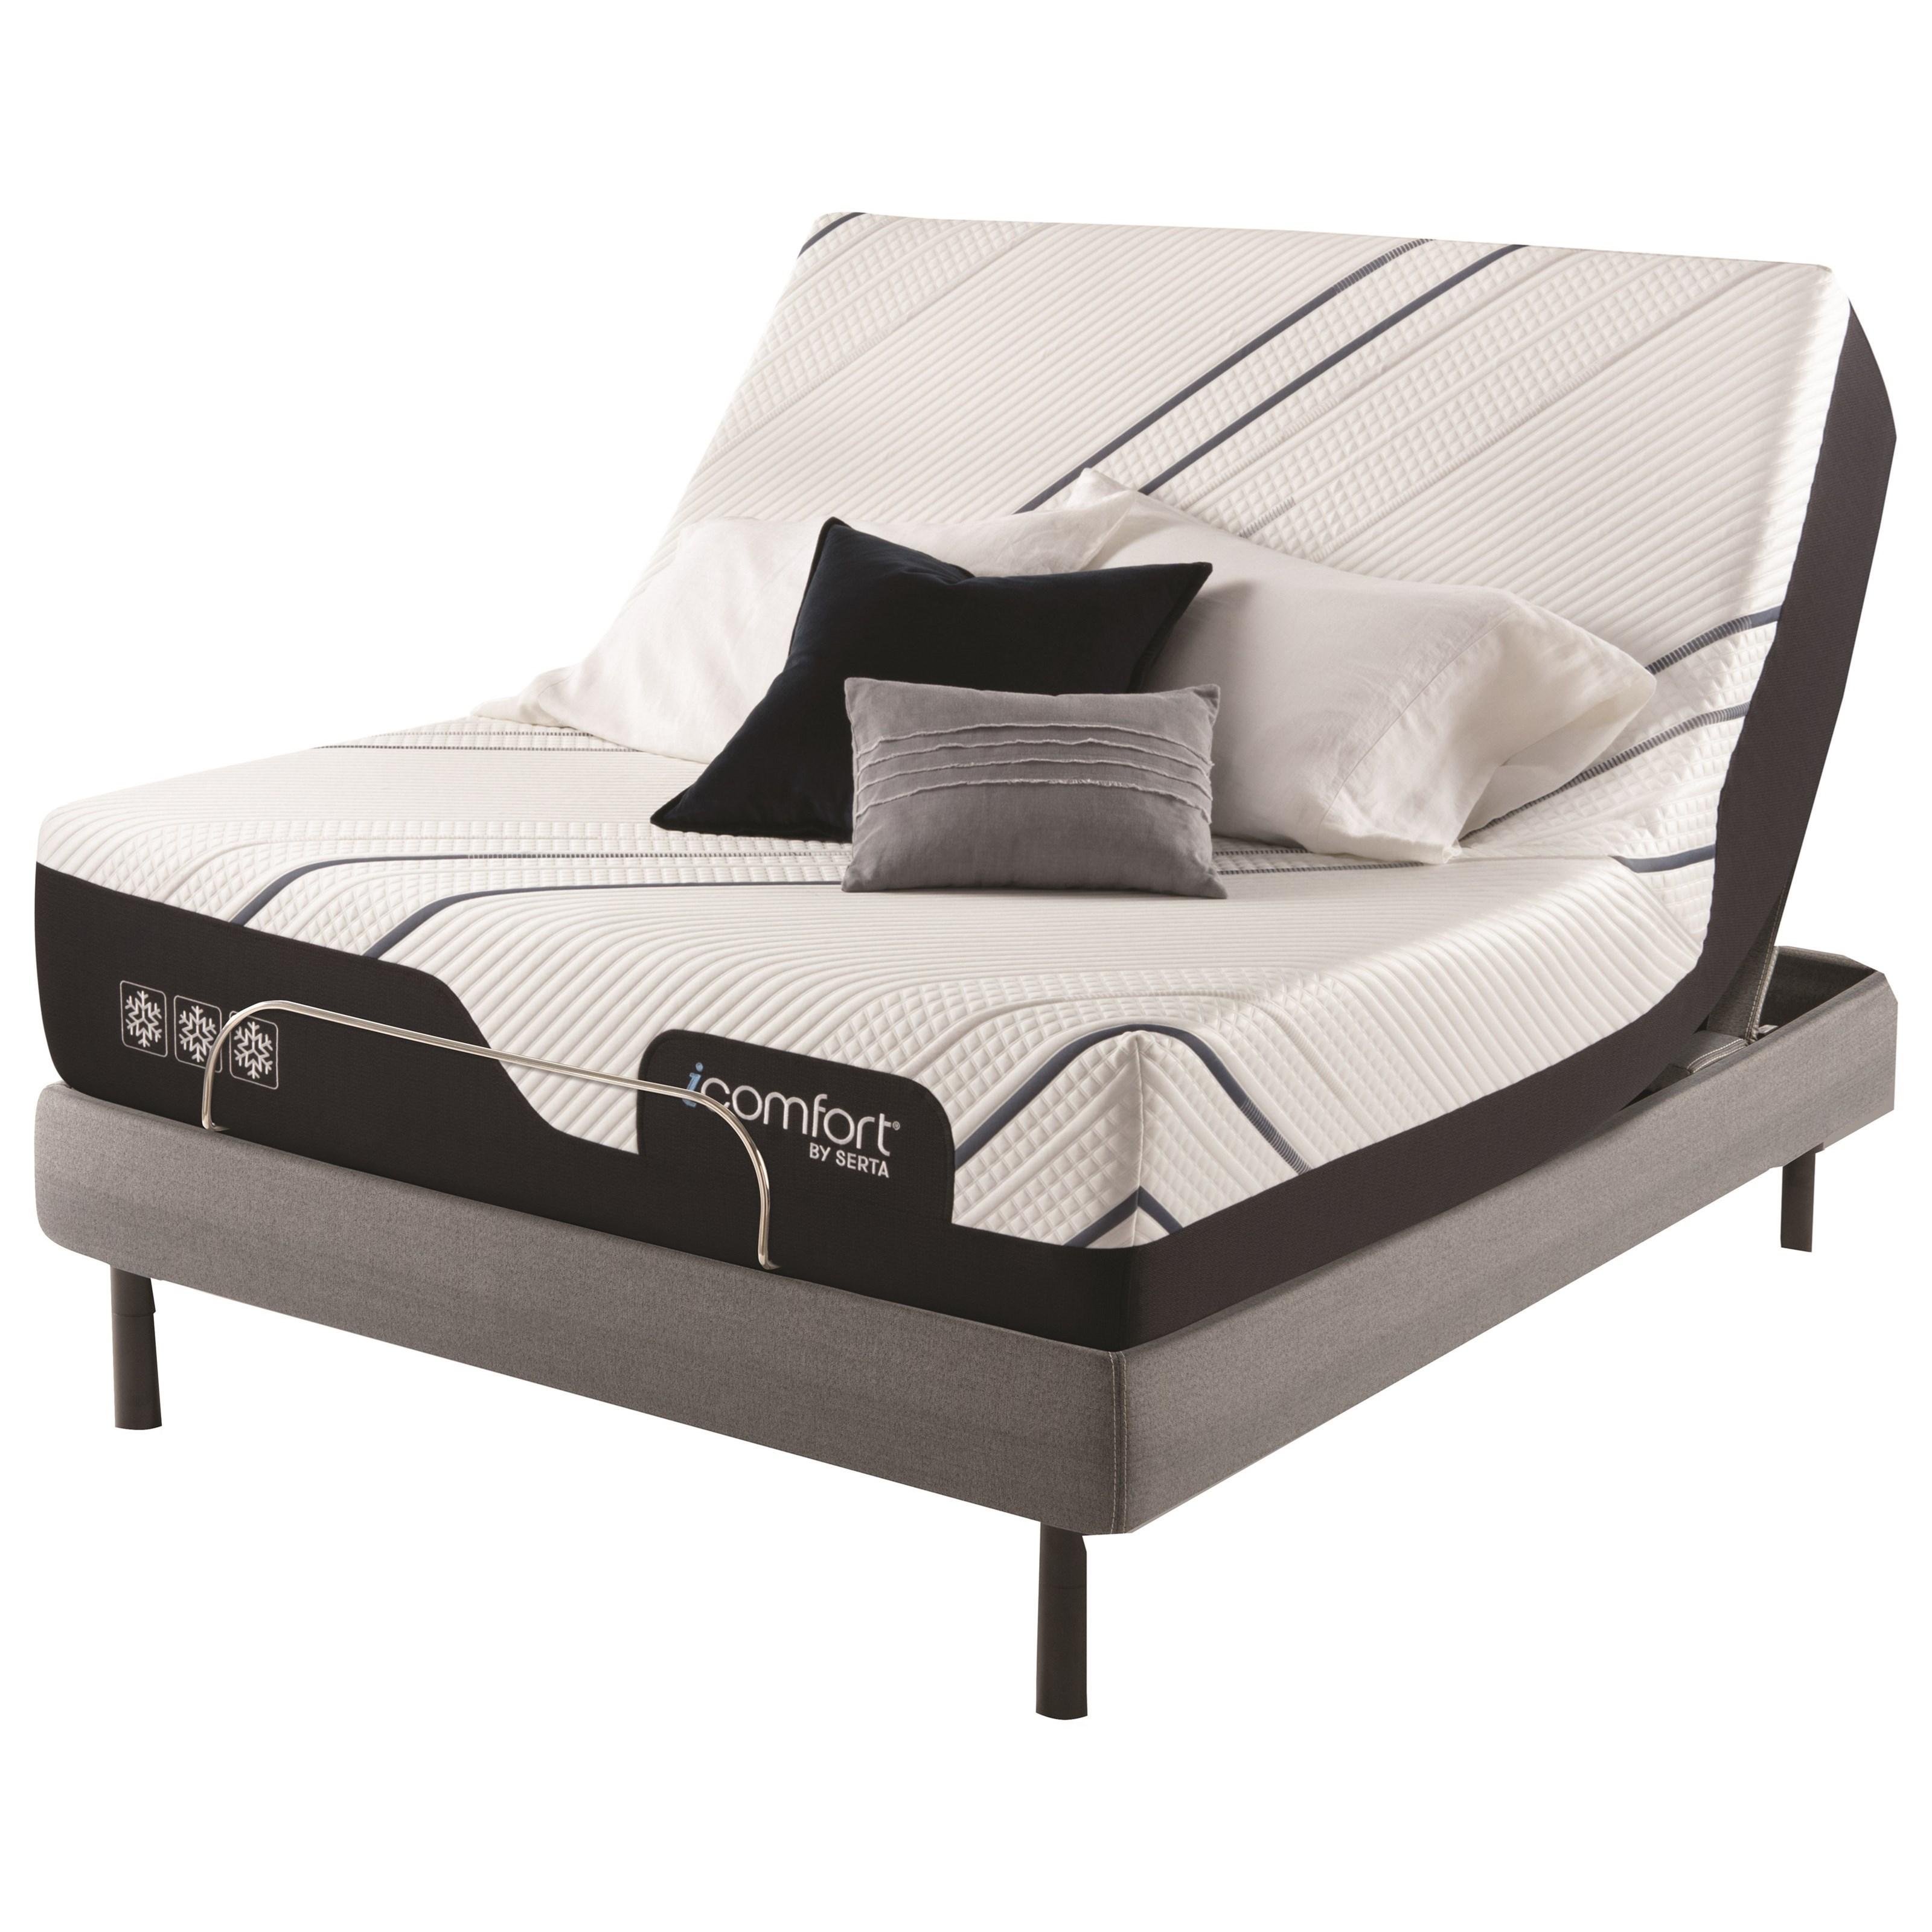 "CF4000 Ultra Plush Queen 13 1/2"" Ultra Plush Adj Set by Serta at Miller Waldrop Furniture and Decor"